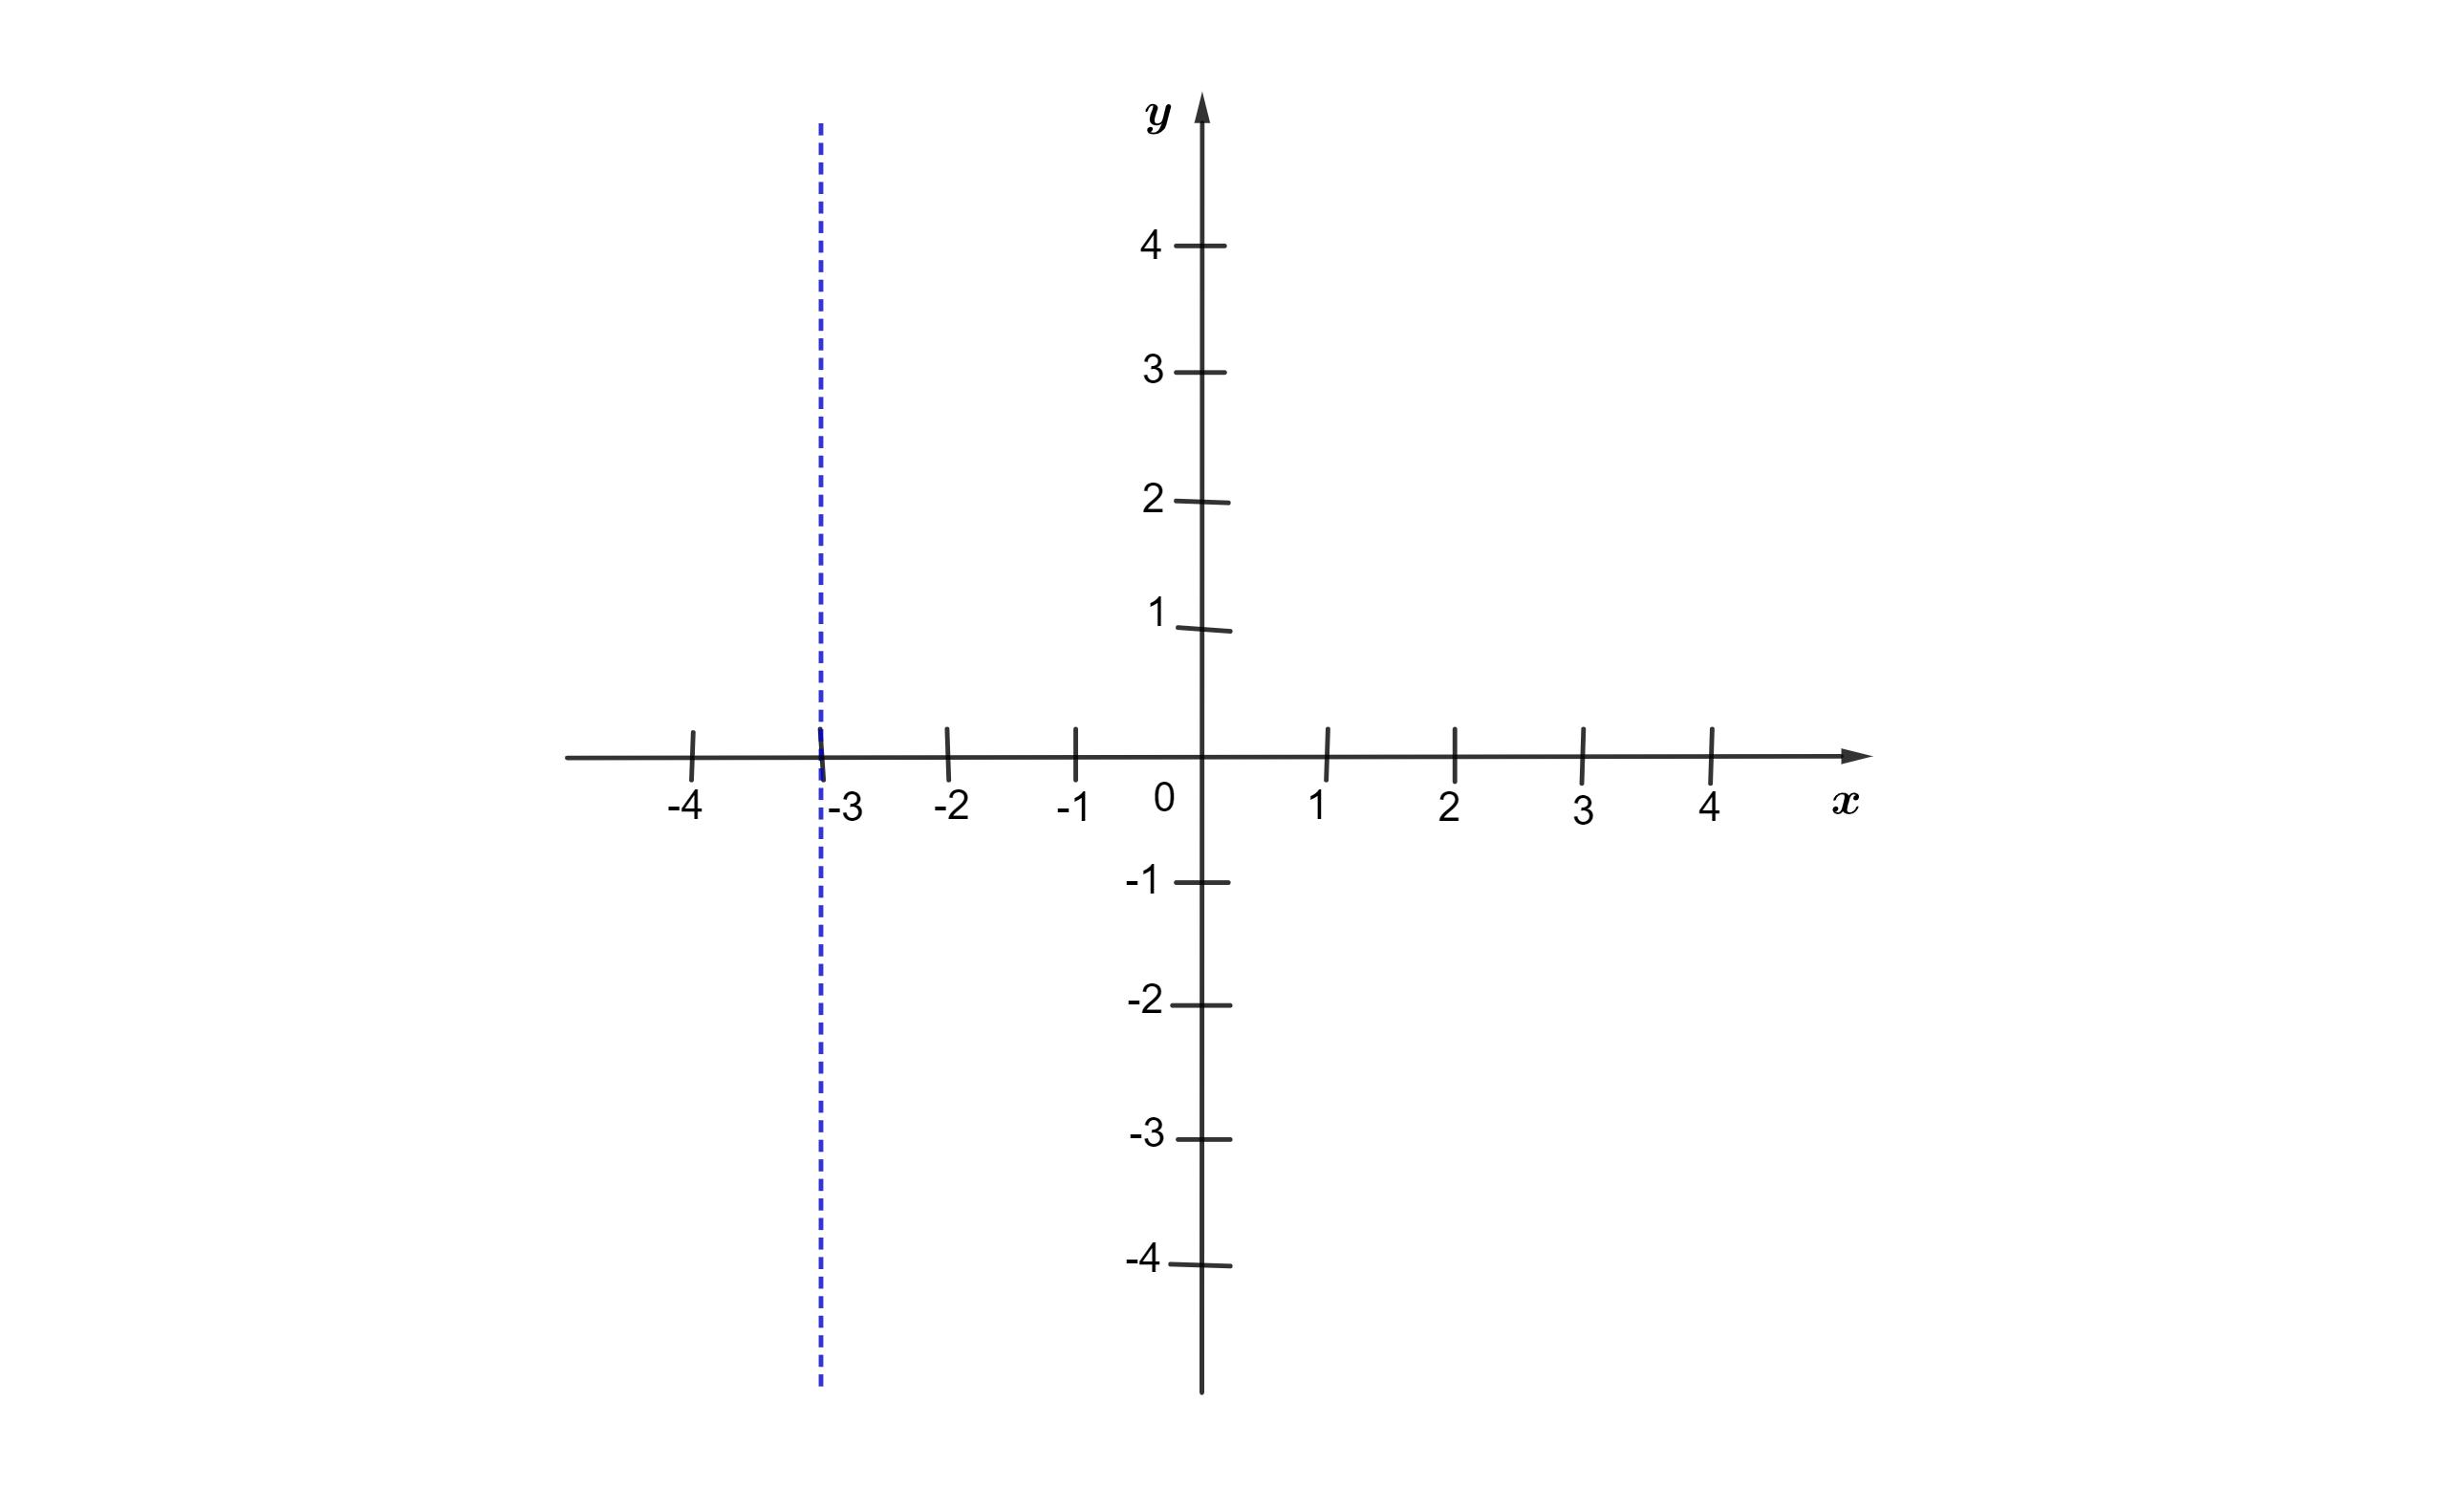 marcando pontos no plano cartesiano